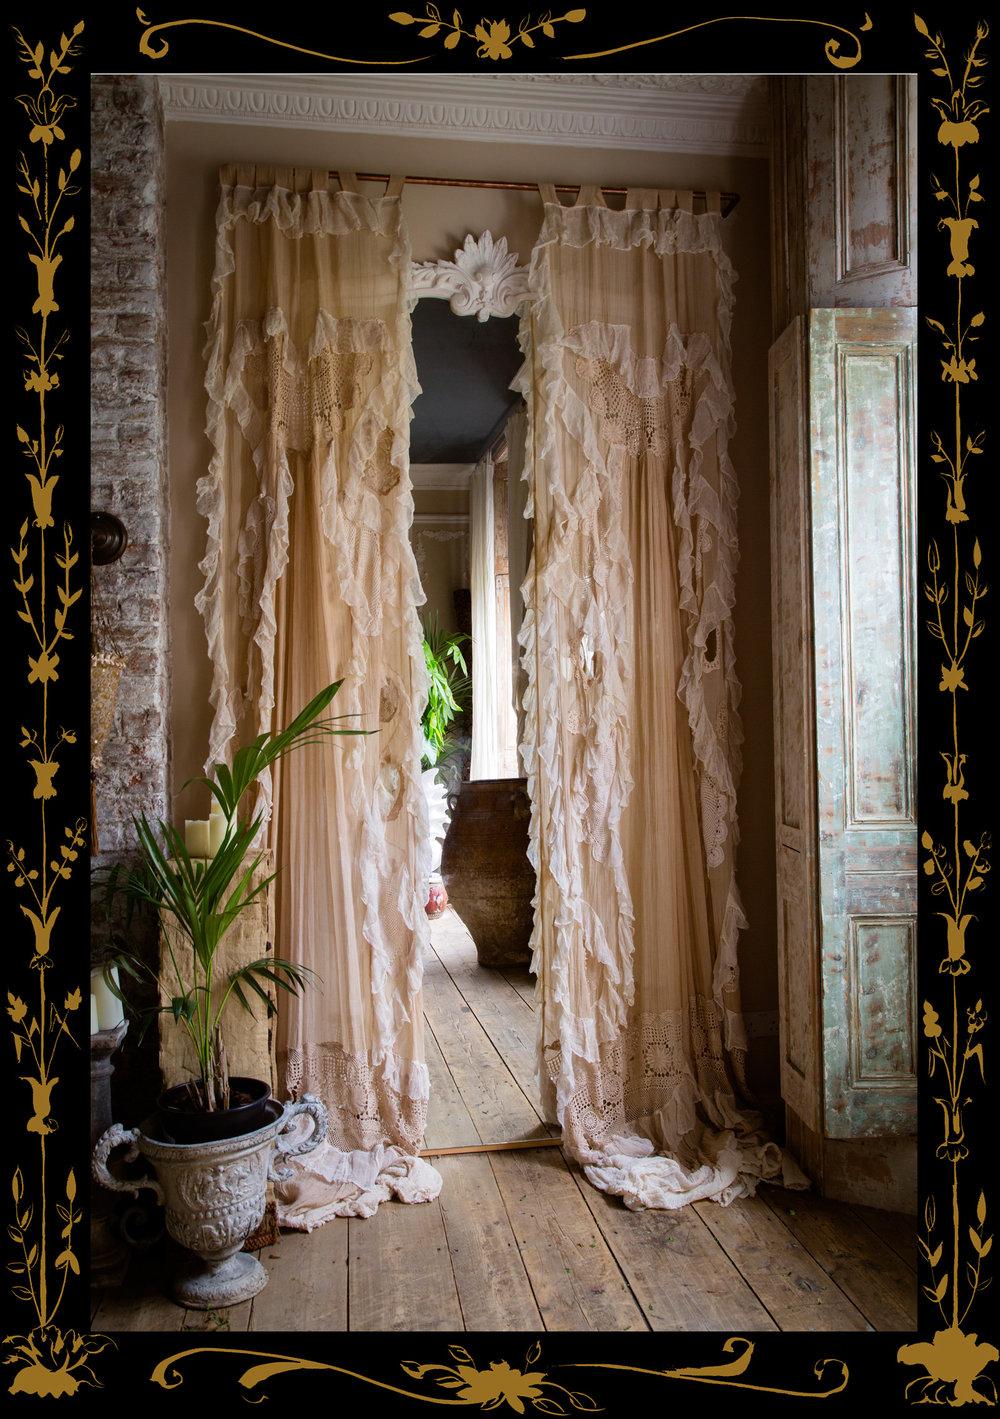 Curtain-38.jpg